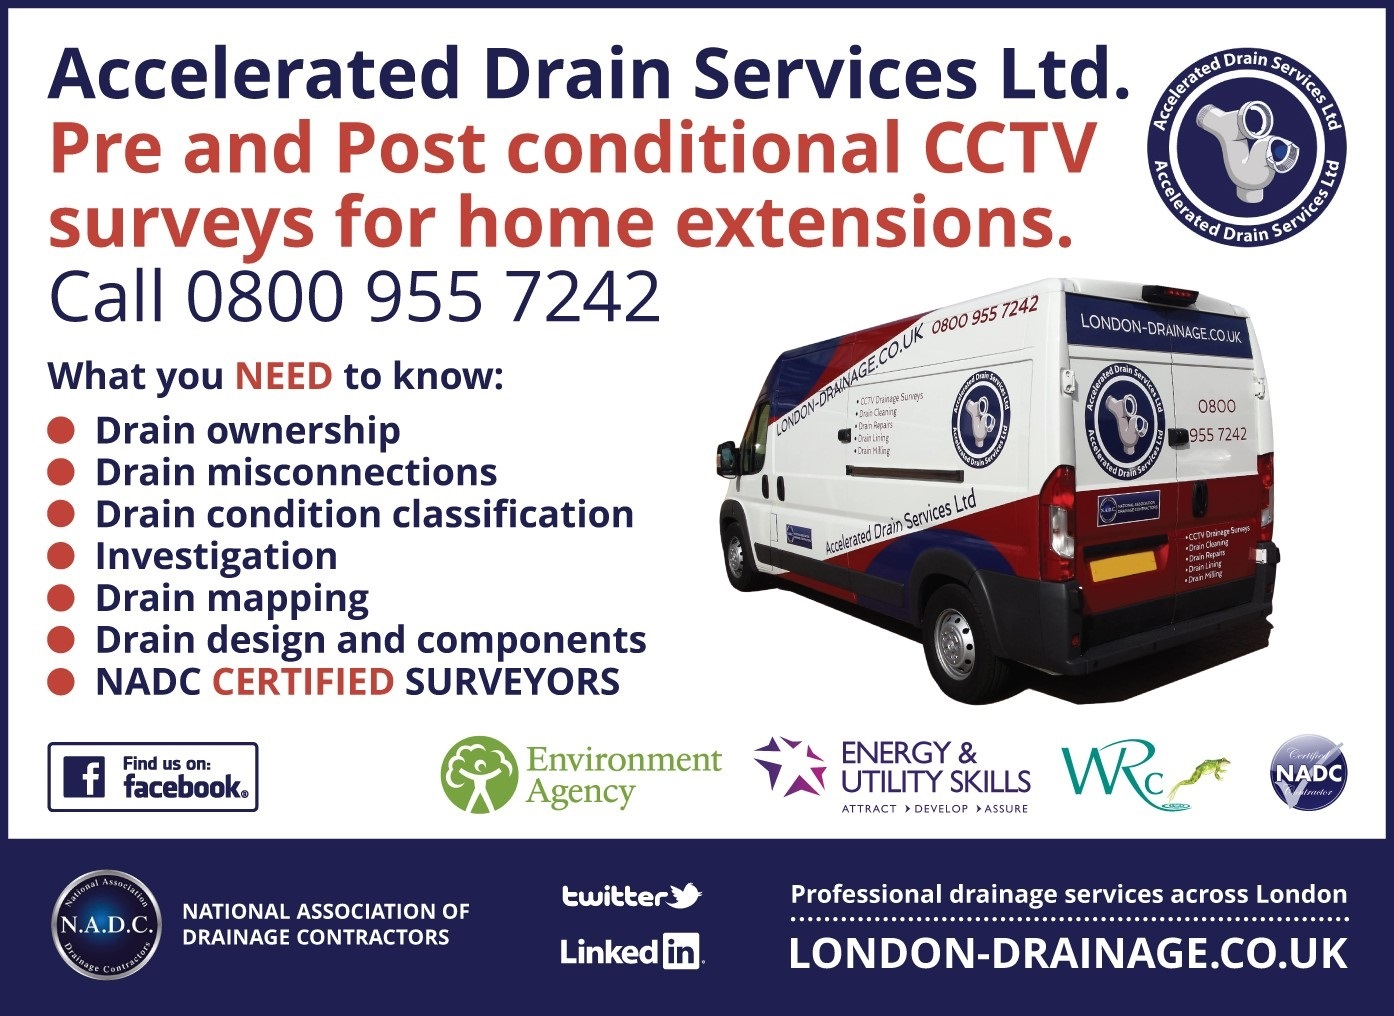 Build Over Drainage Surveys, Southwark - SE1, SE11, SE15, SE16, SE17, SE19, SE21, SE22, SE23, SE24, SE26, SE5, SE8